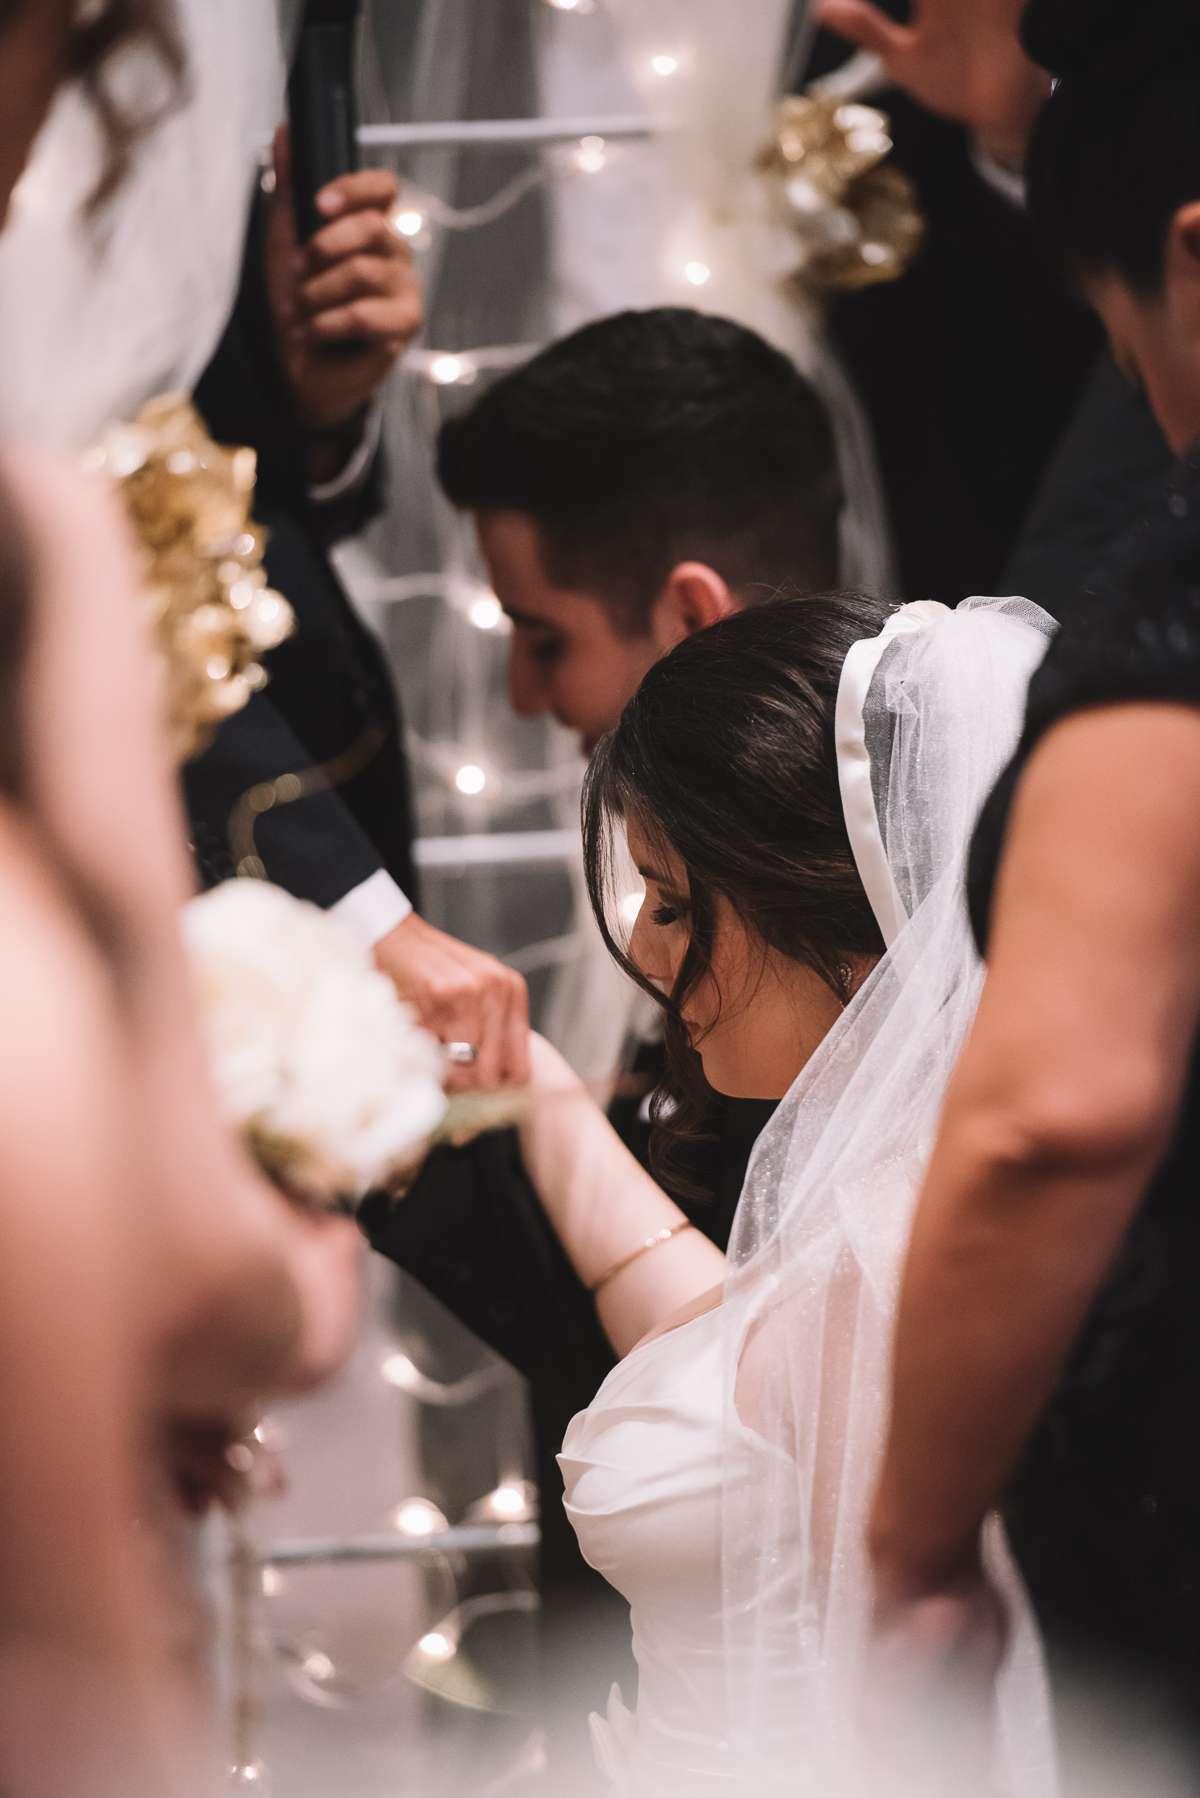 shannongray-ivanadanny-wedding-44